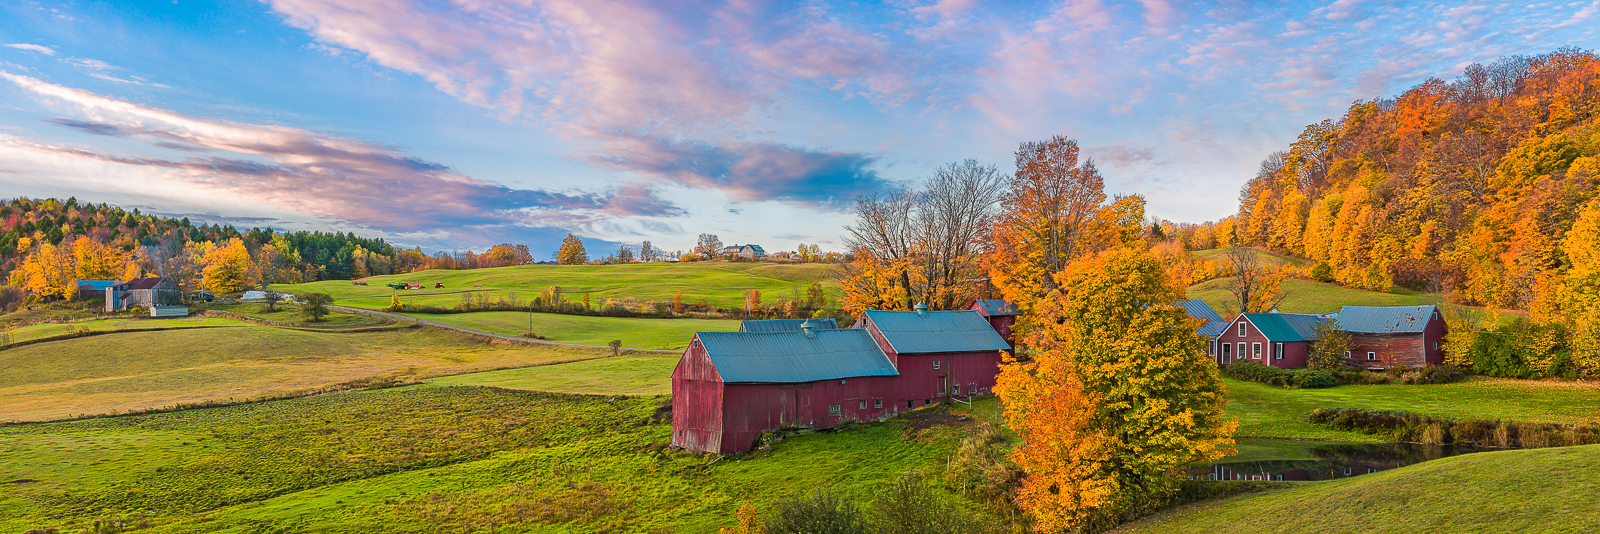 An old New England farm enjoys the bluebird color skies and vibrant autumn foliage.